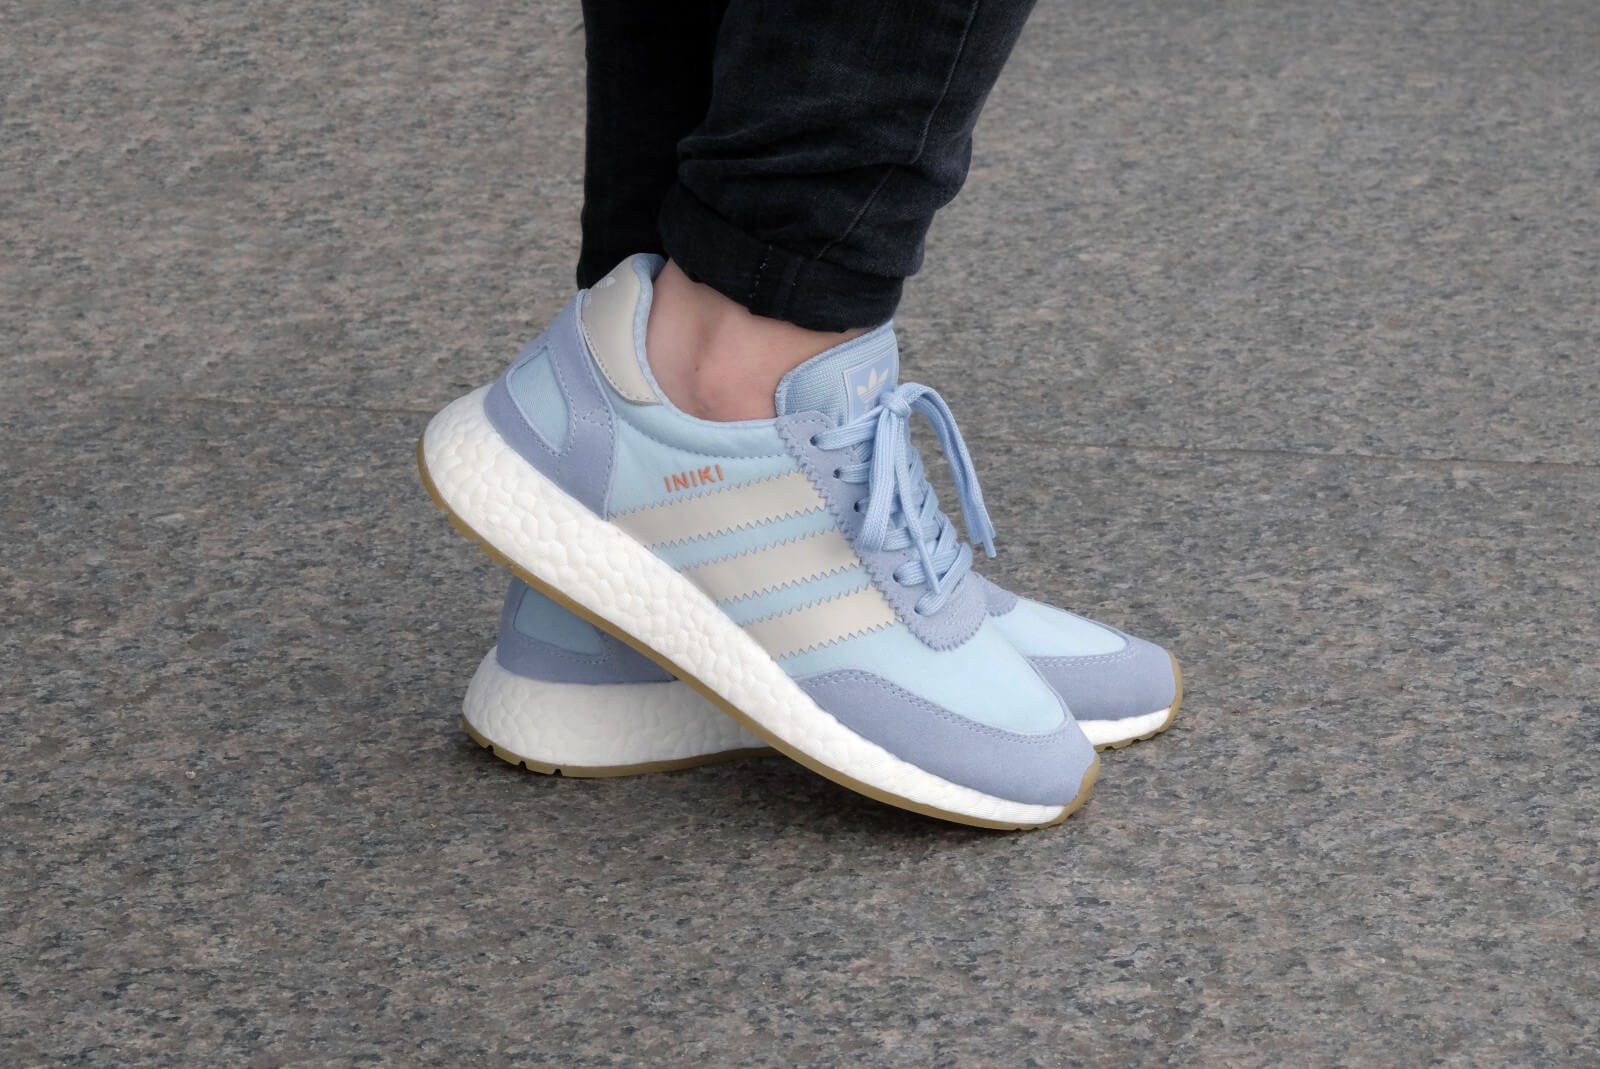 Adidas Iniki Runner Easy Blue & Pearl Grey | END.